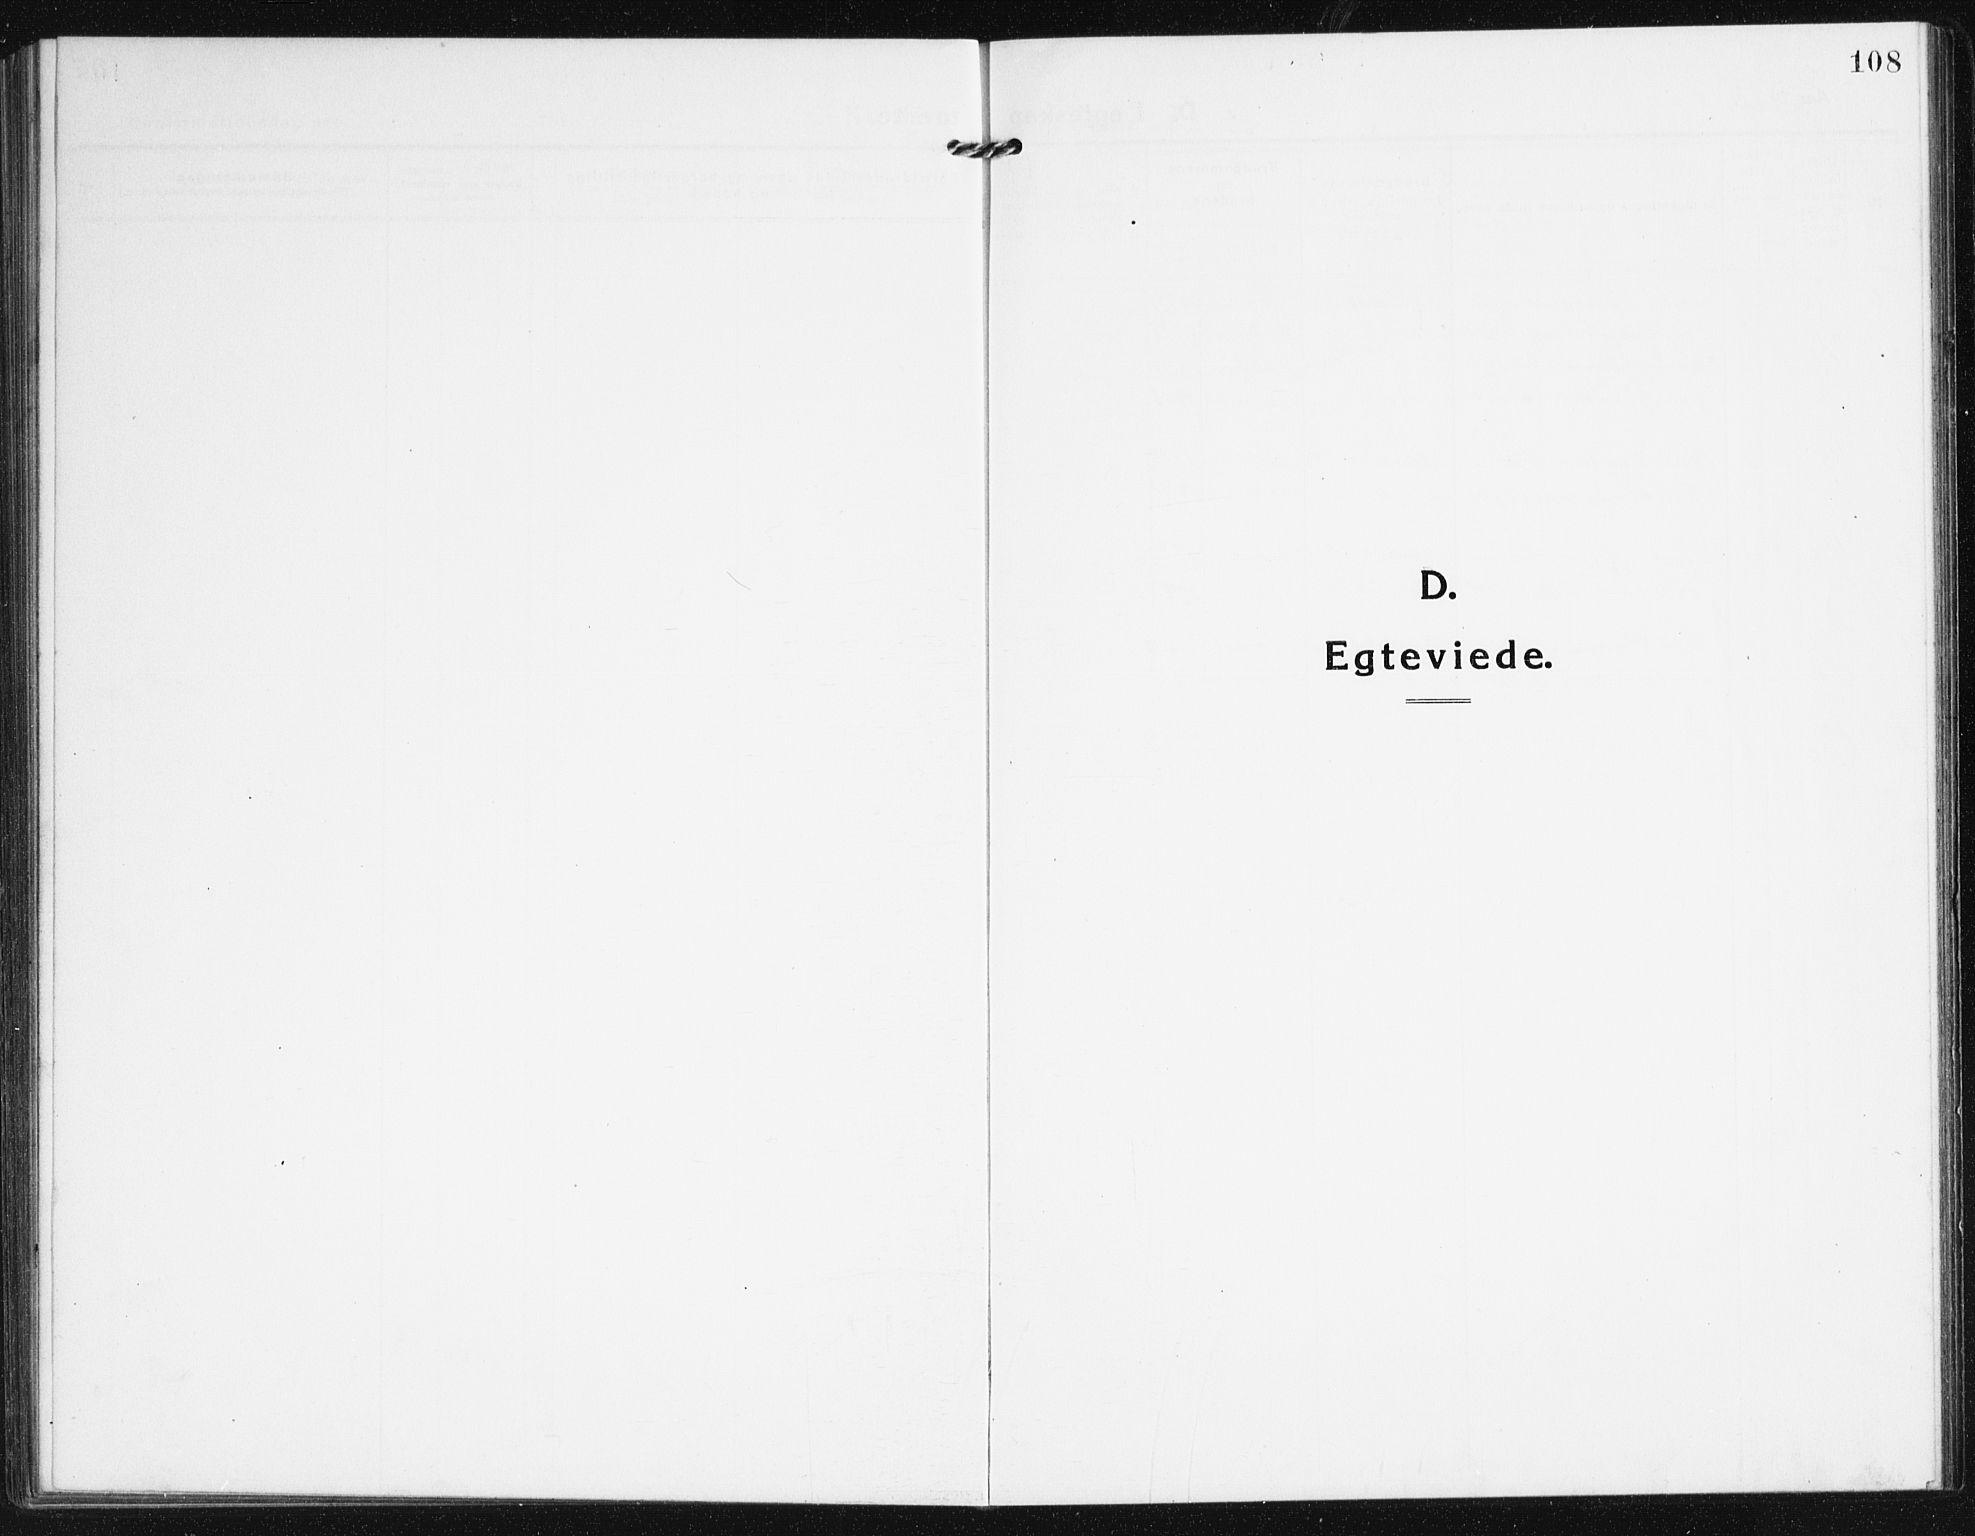 SAK, Valle sokneprestkontor, F/Fb/Fba/L0004: Klokkerbok nr. B 4, 1917-1944, s. 109